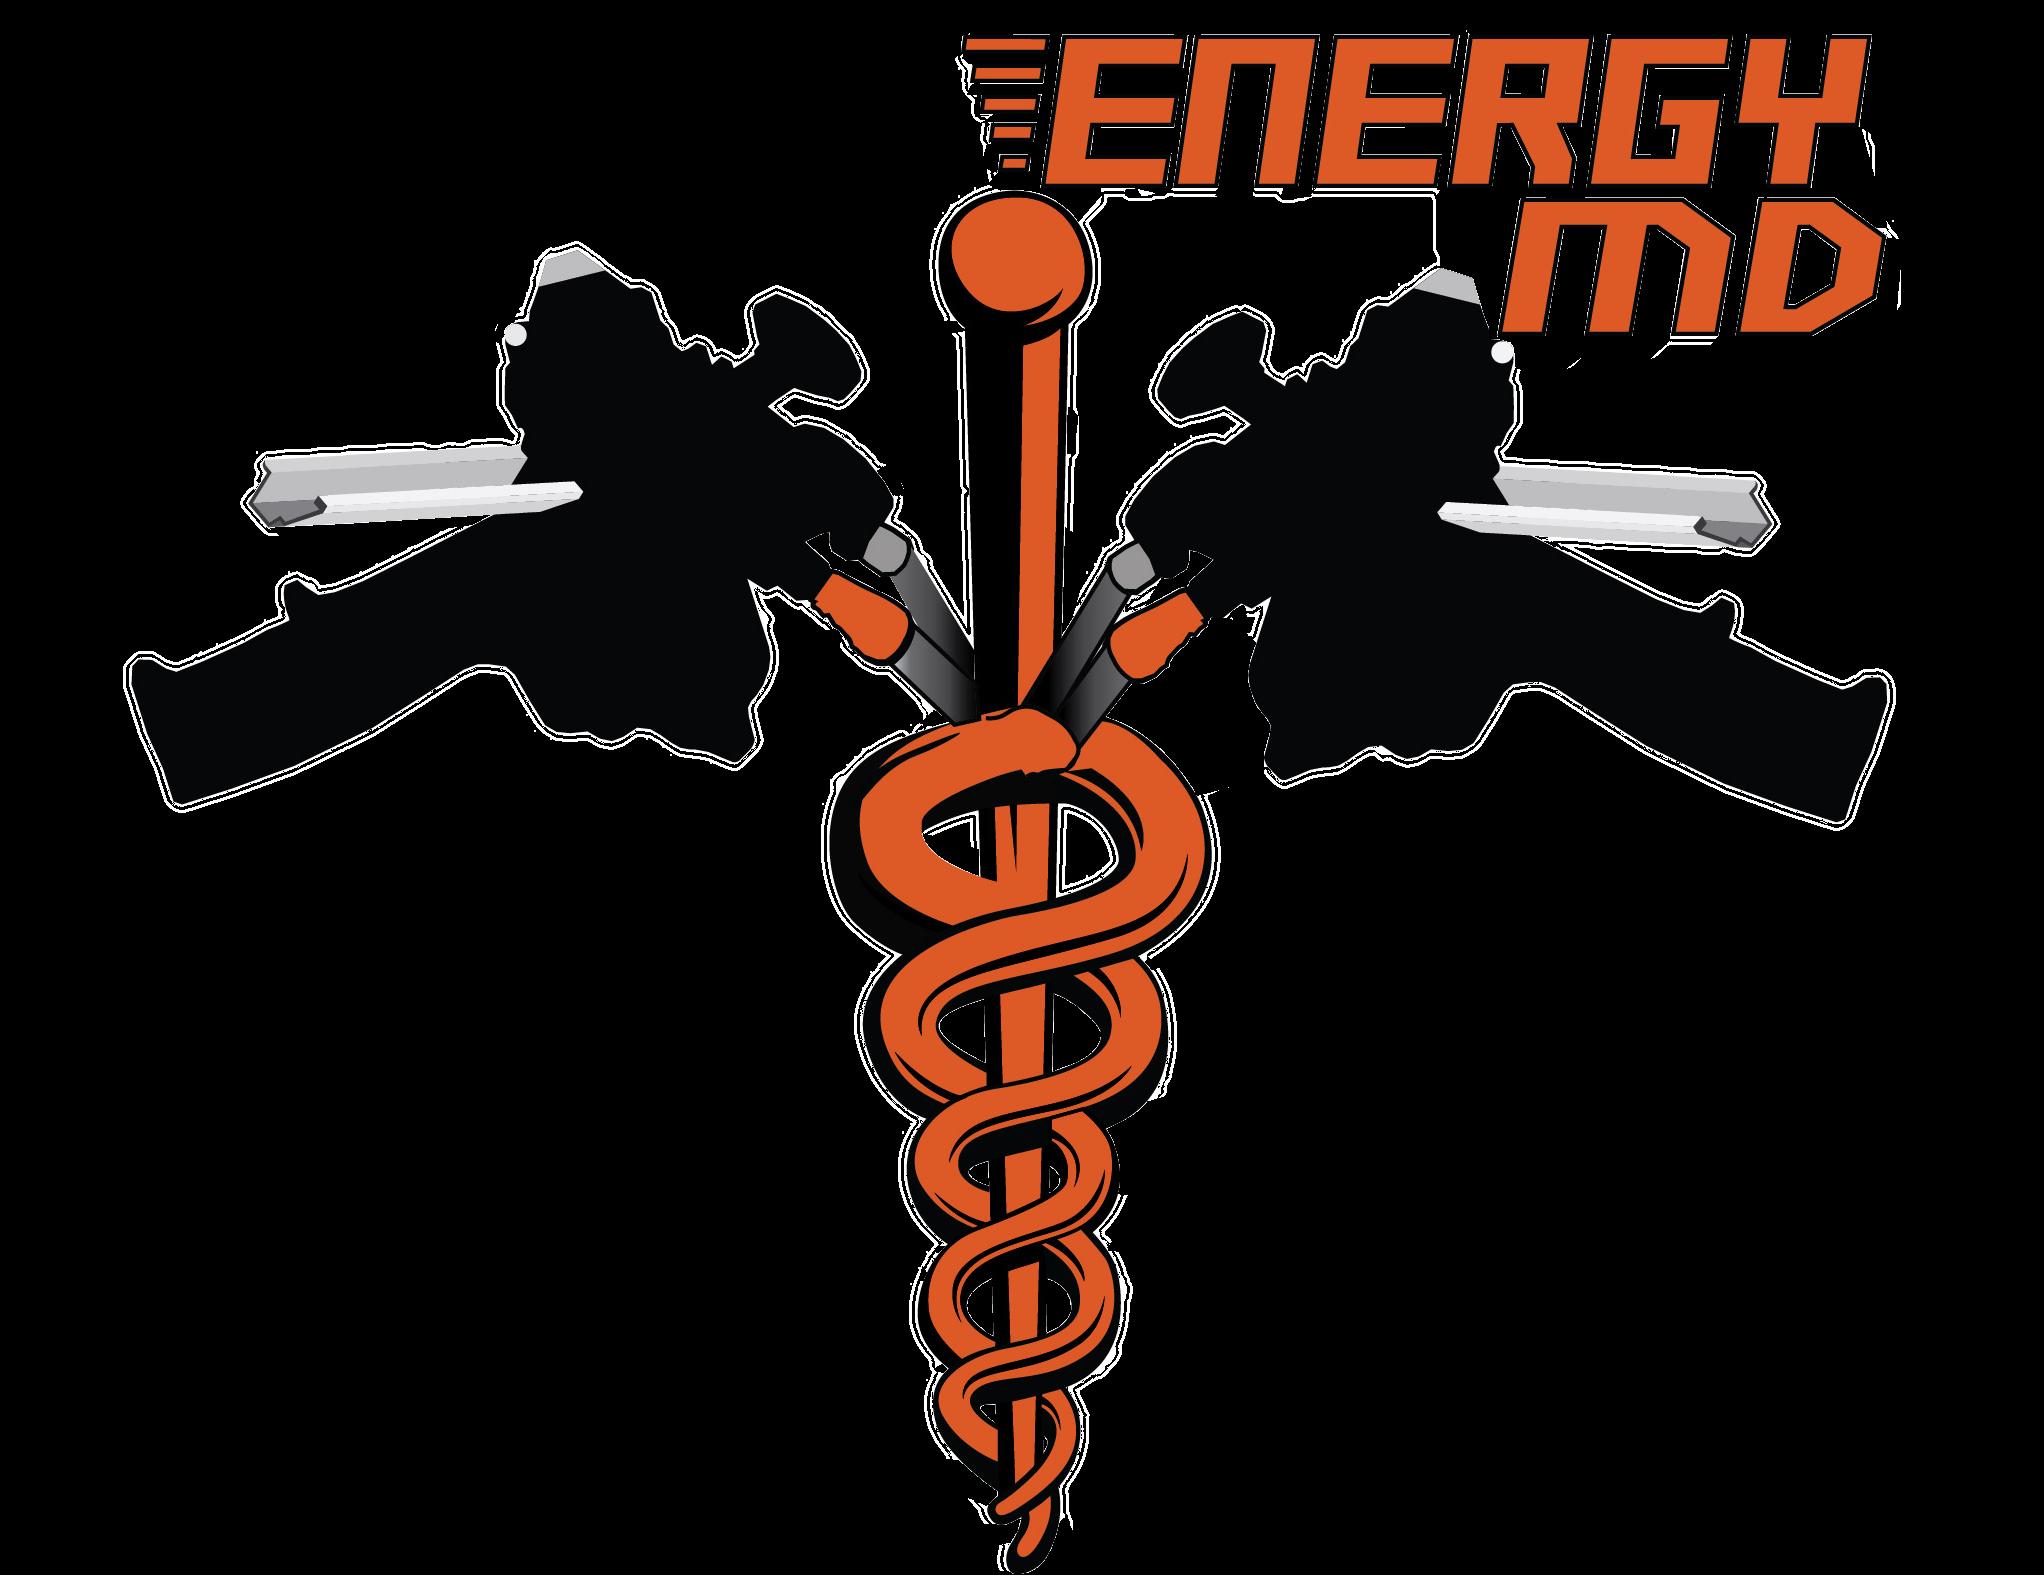 My Energy MD